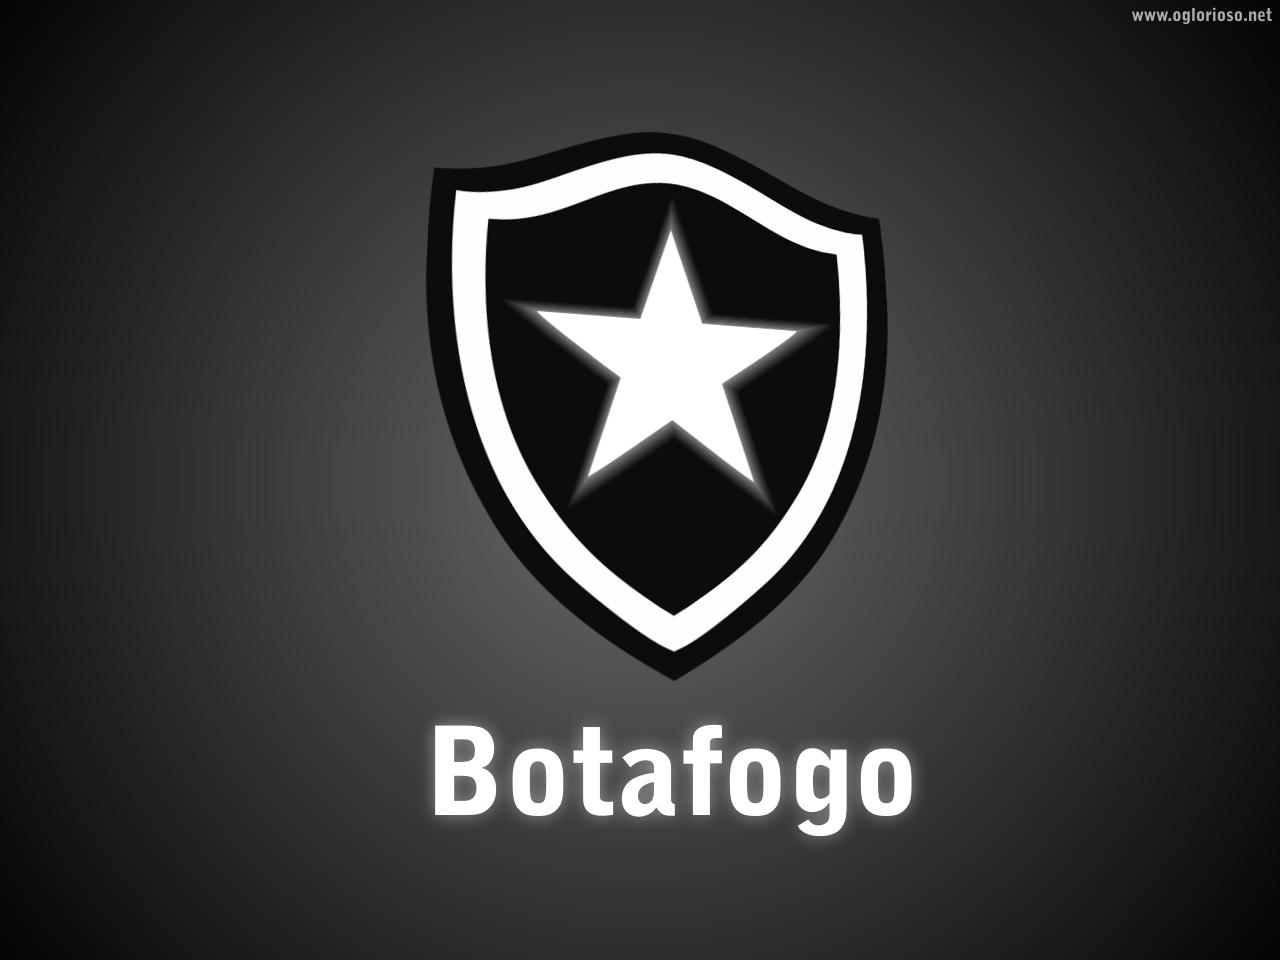 3d Wallpaper For Iphone Se Papel De Parede Botafogo Escudo Wallpaper Para Download